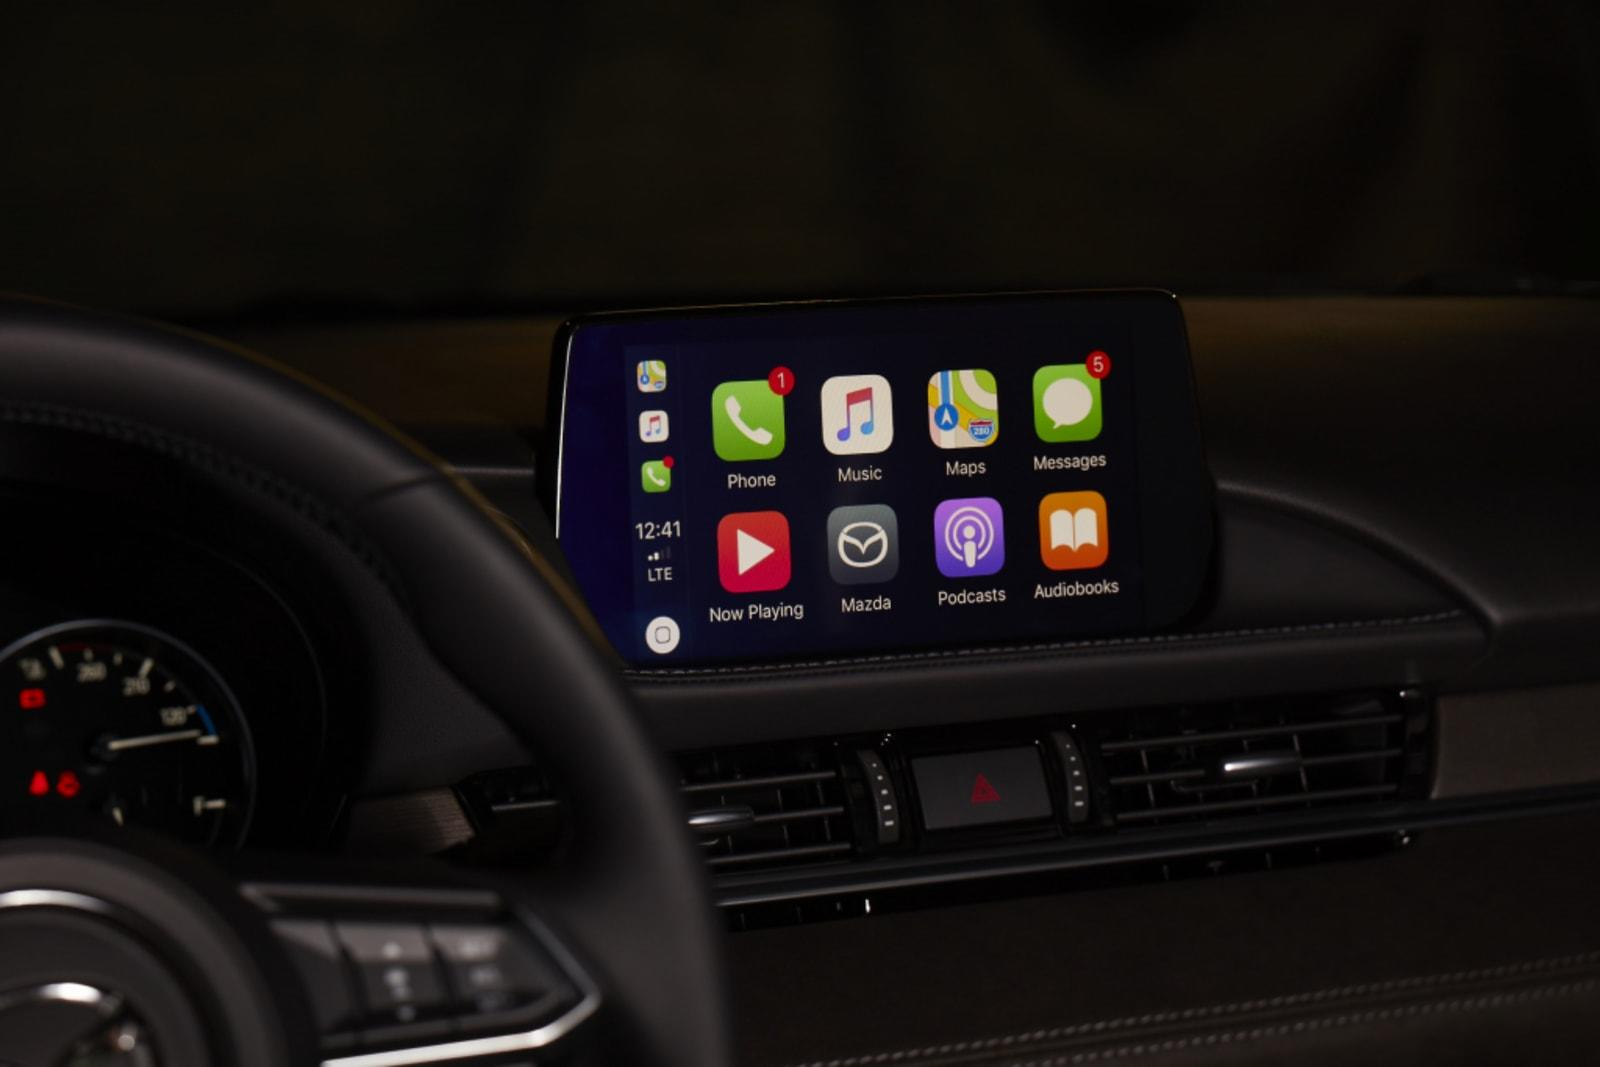 Kelebihan Android Auto Mazda Perbandingan Harga